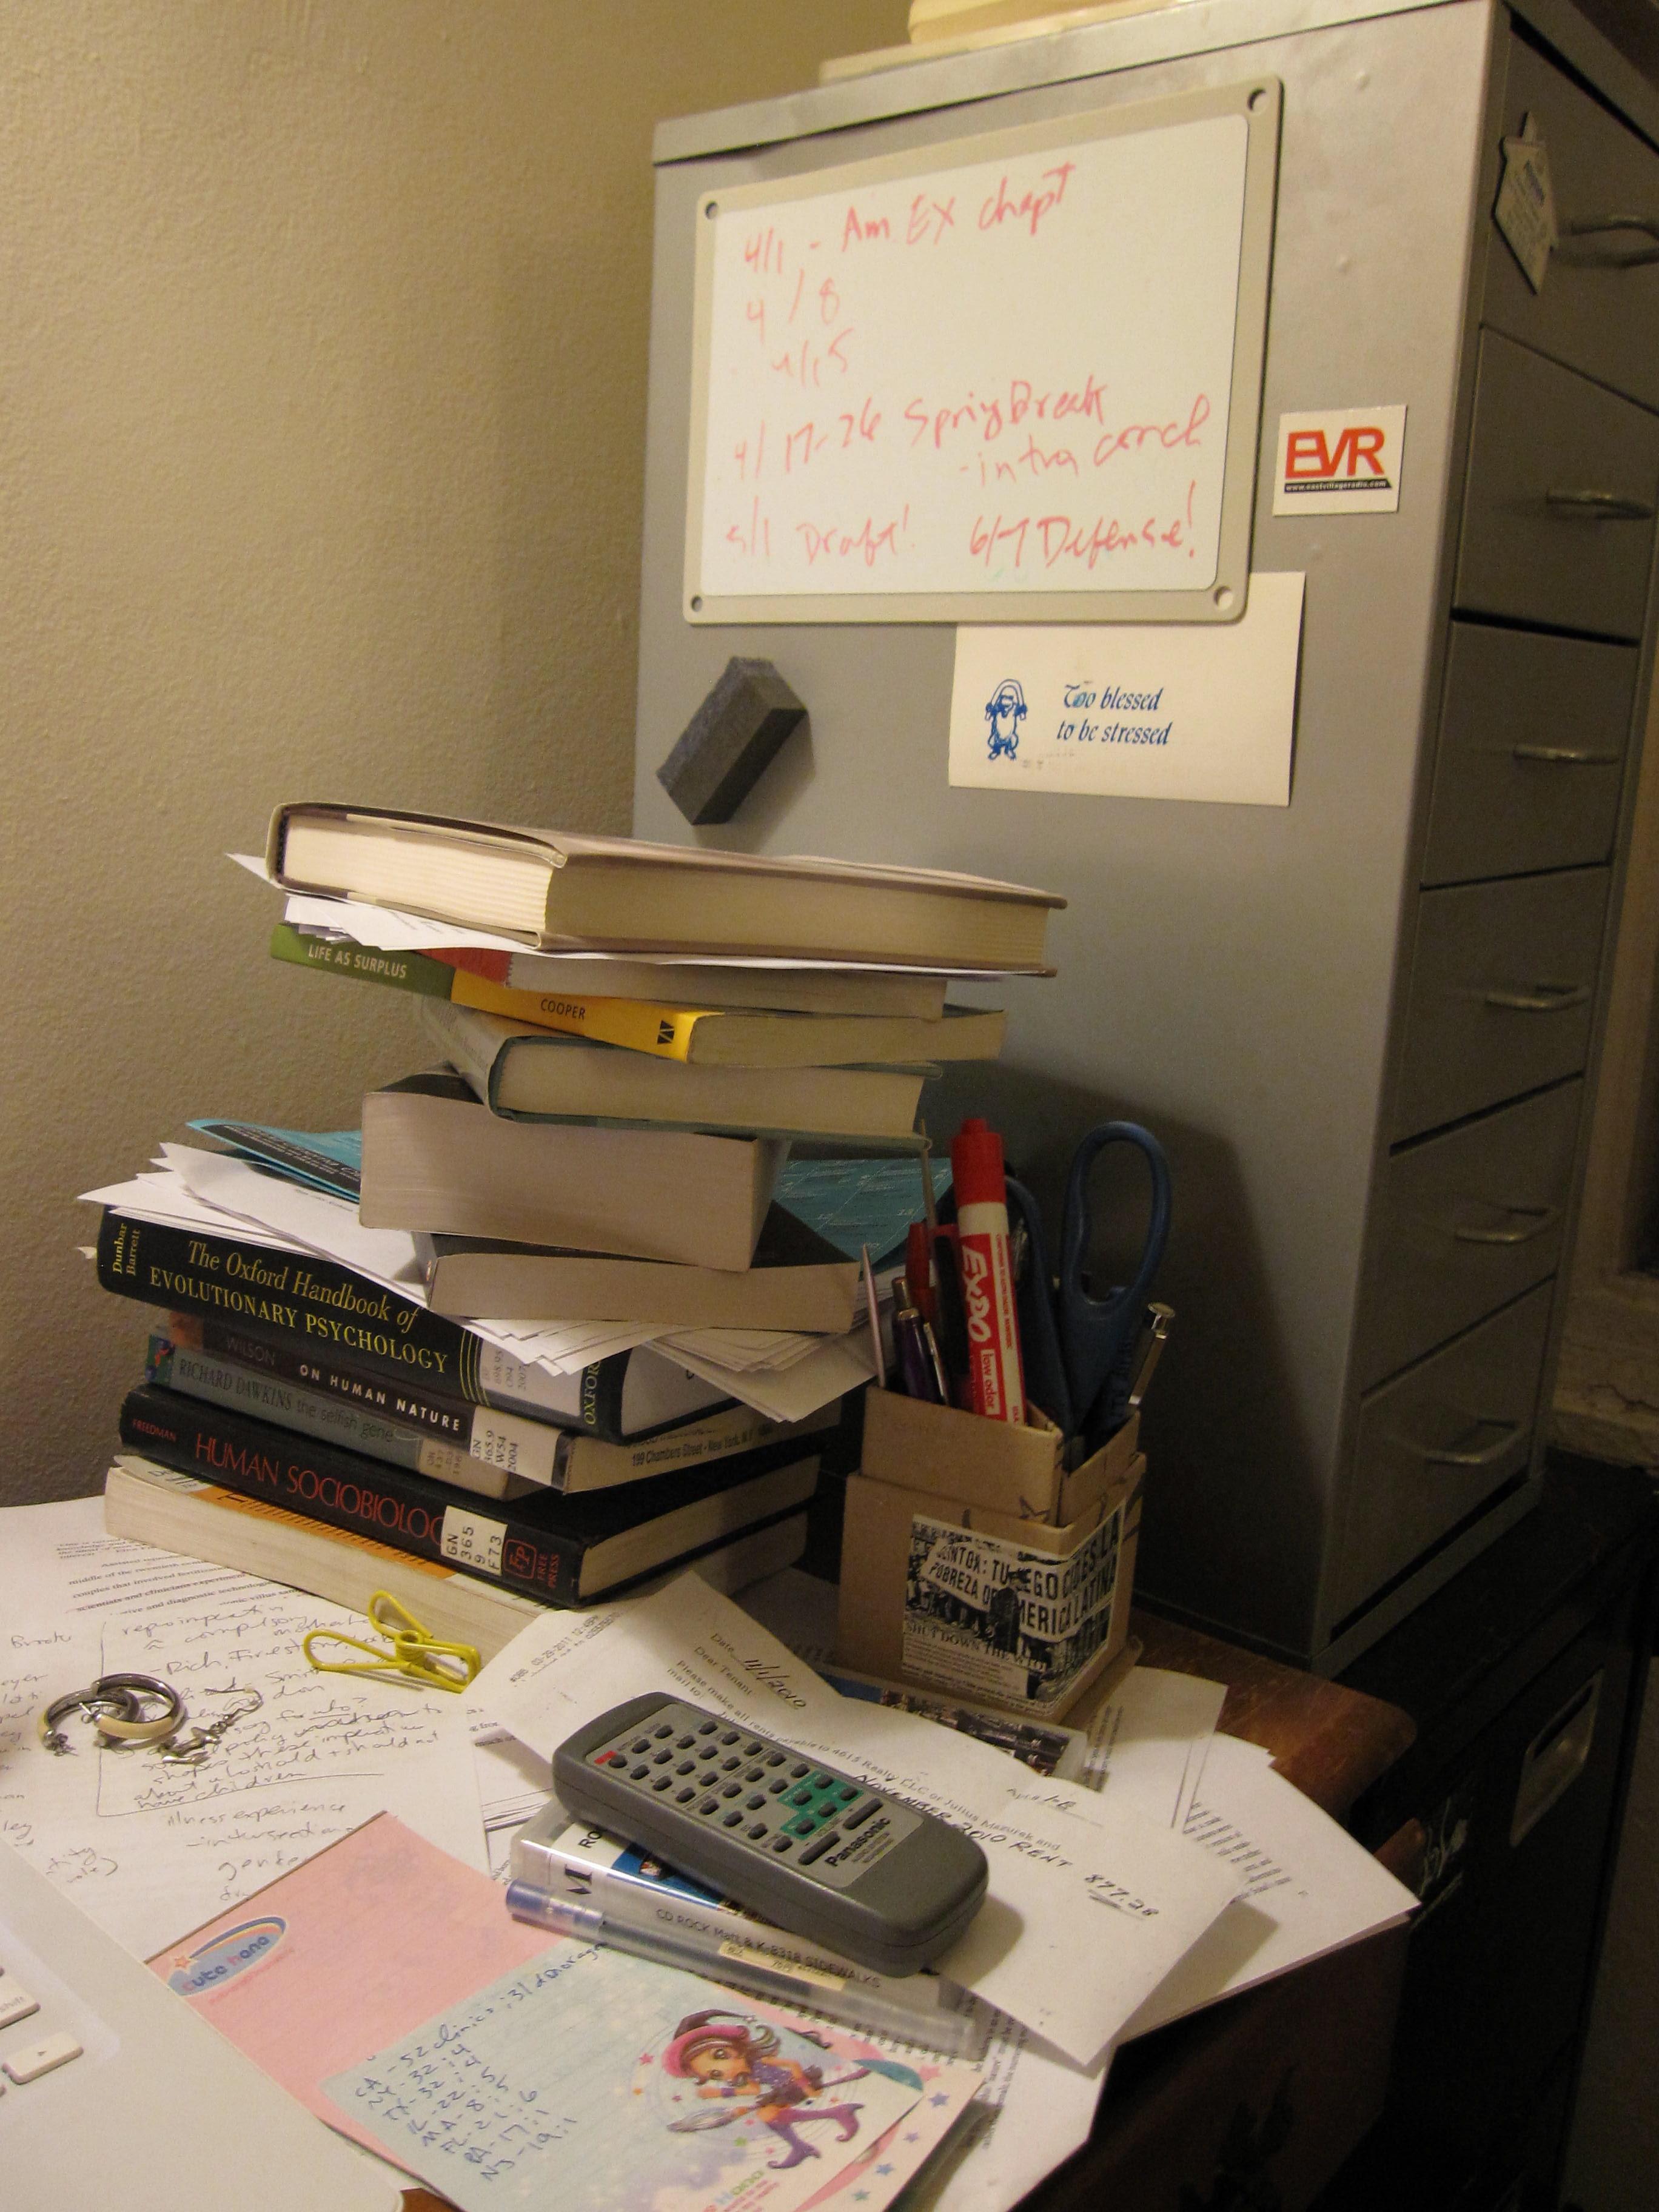 Components phd dissertation